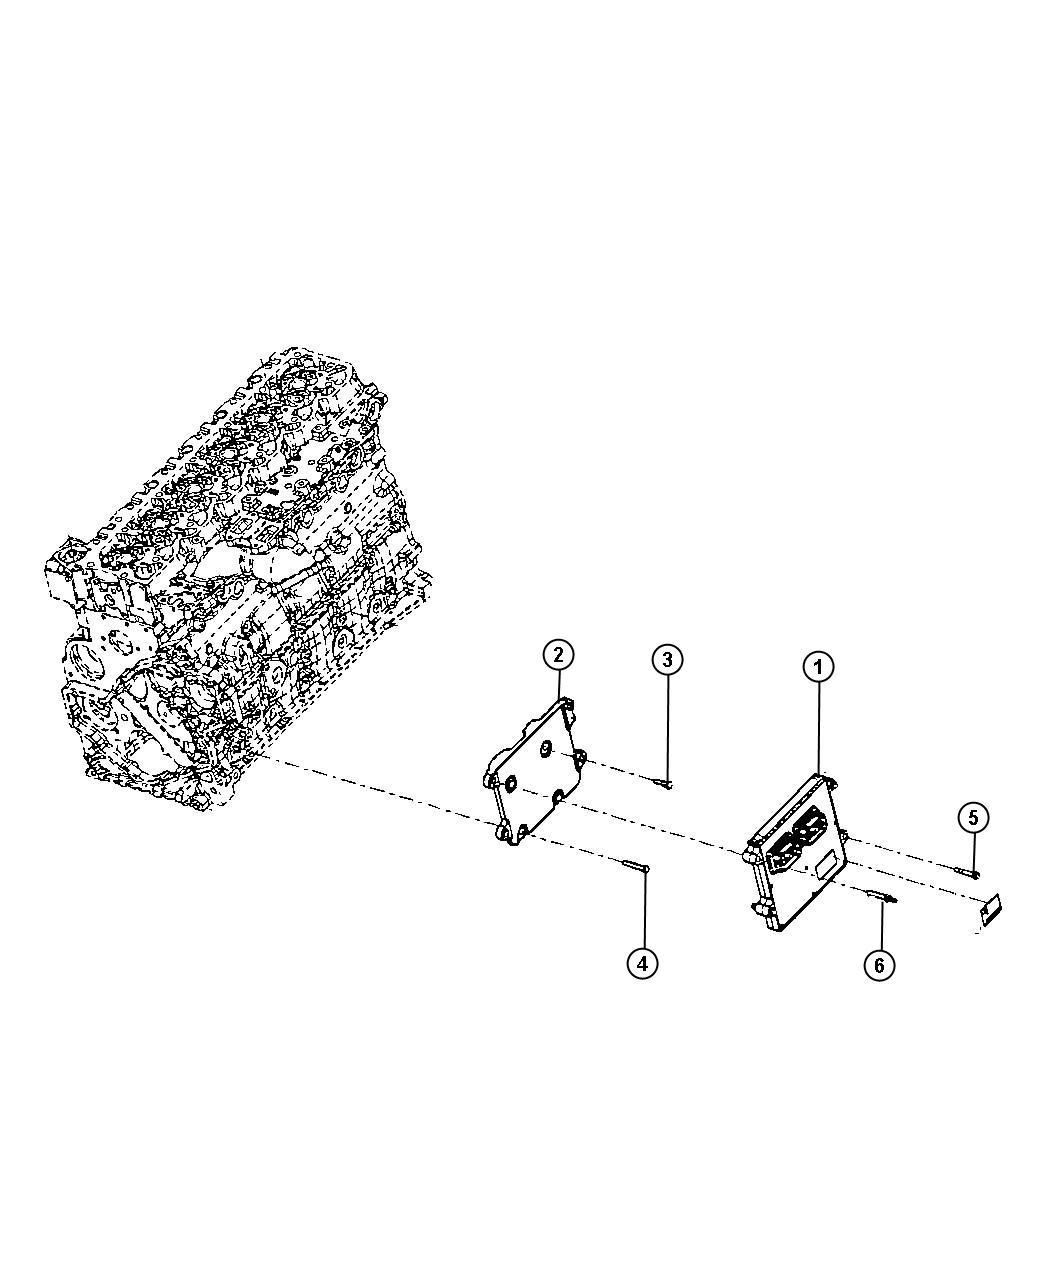 Dodge Ram 3500 Screw. Hex head. M8x1.25x50. Mounting. Fuel